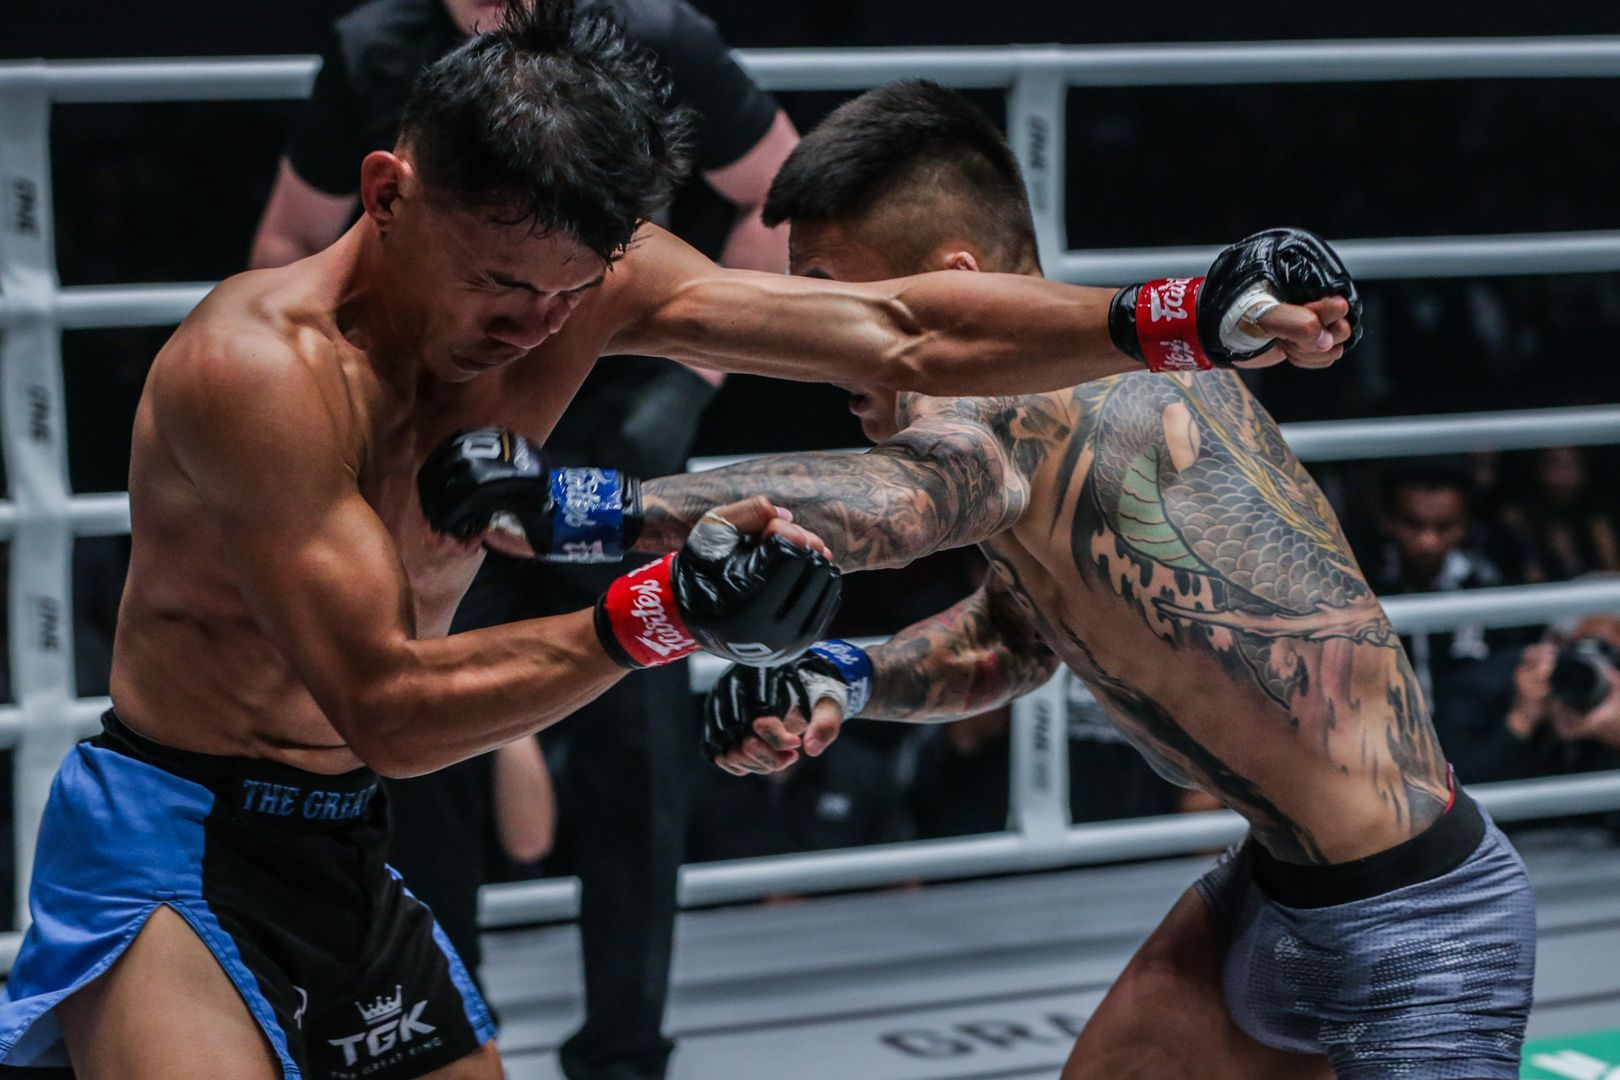 Li Kai Wen defeats Paul Lumihi at ONE MASTERS OF FATE